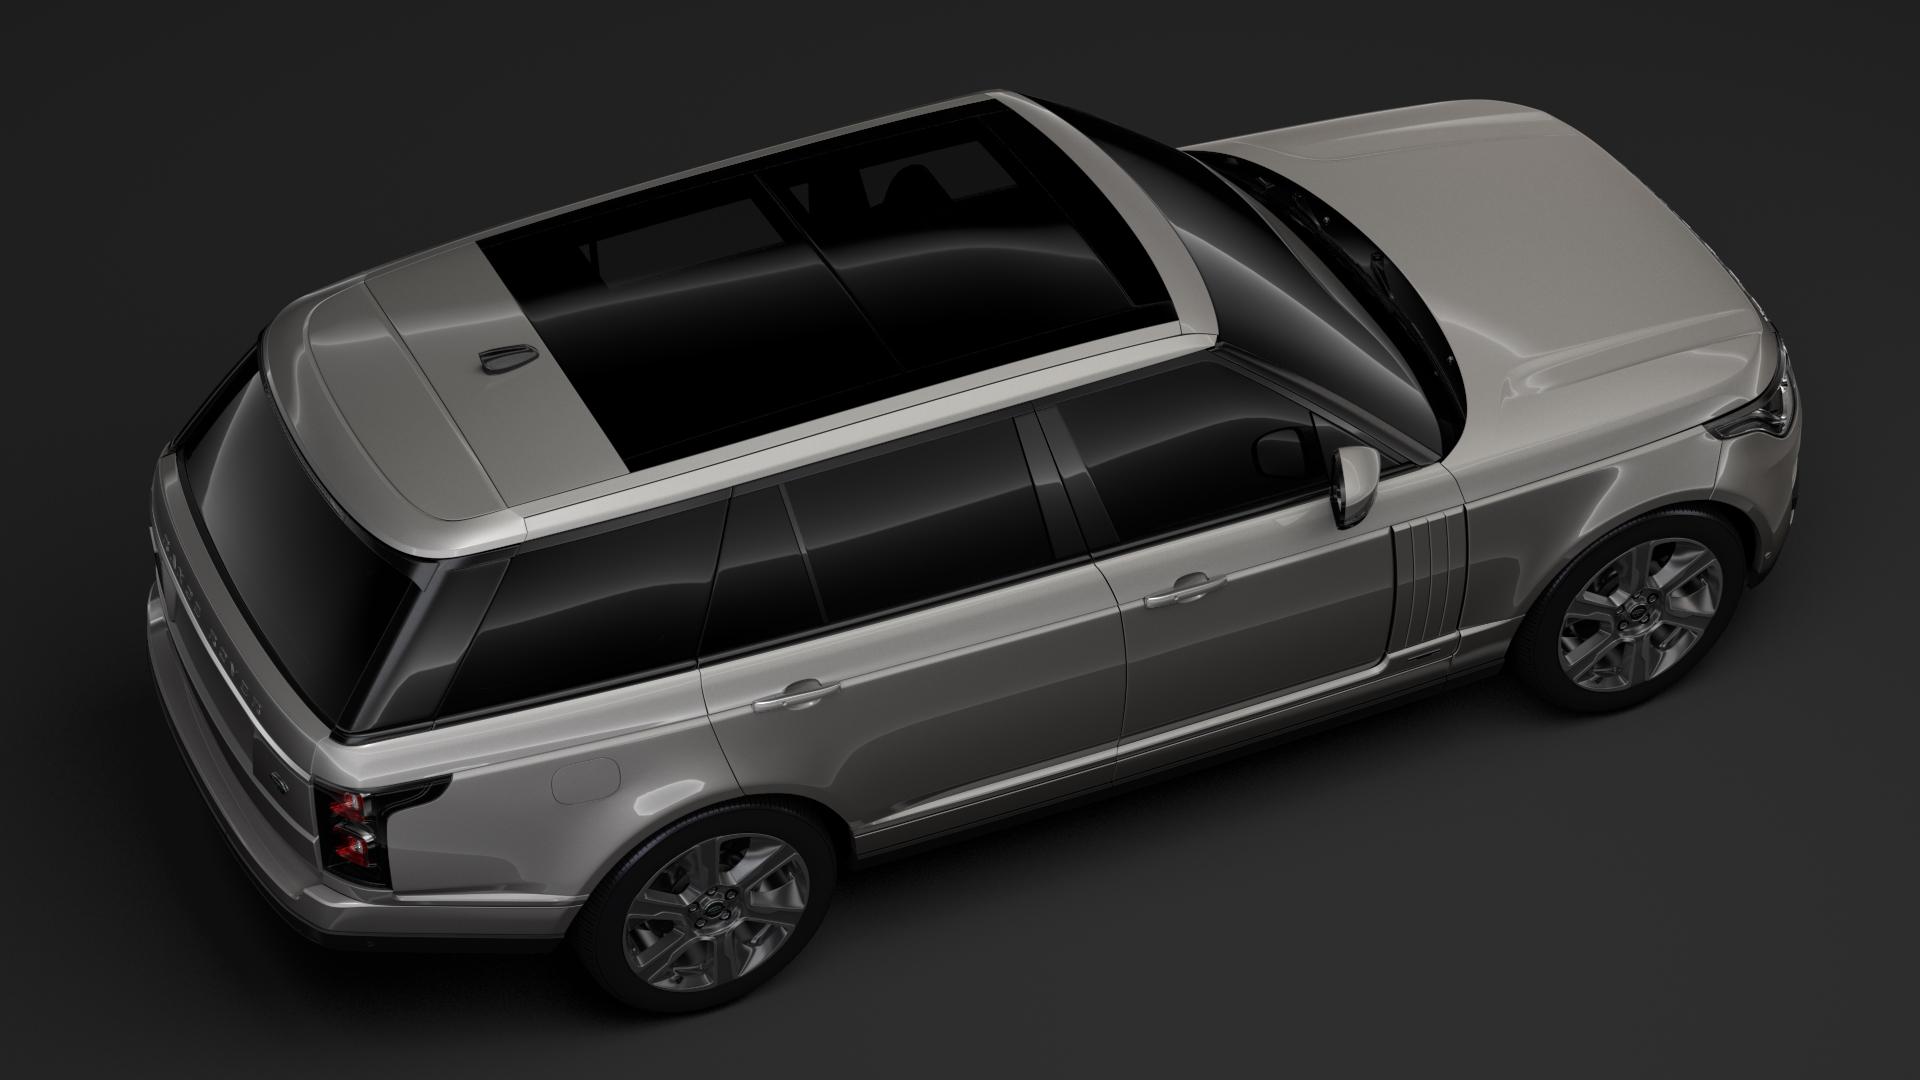 range rover hybrid lwb l405 2018 3d model max fbx c4d lwo ma mb hrc xsi obj 277415